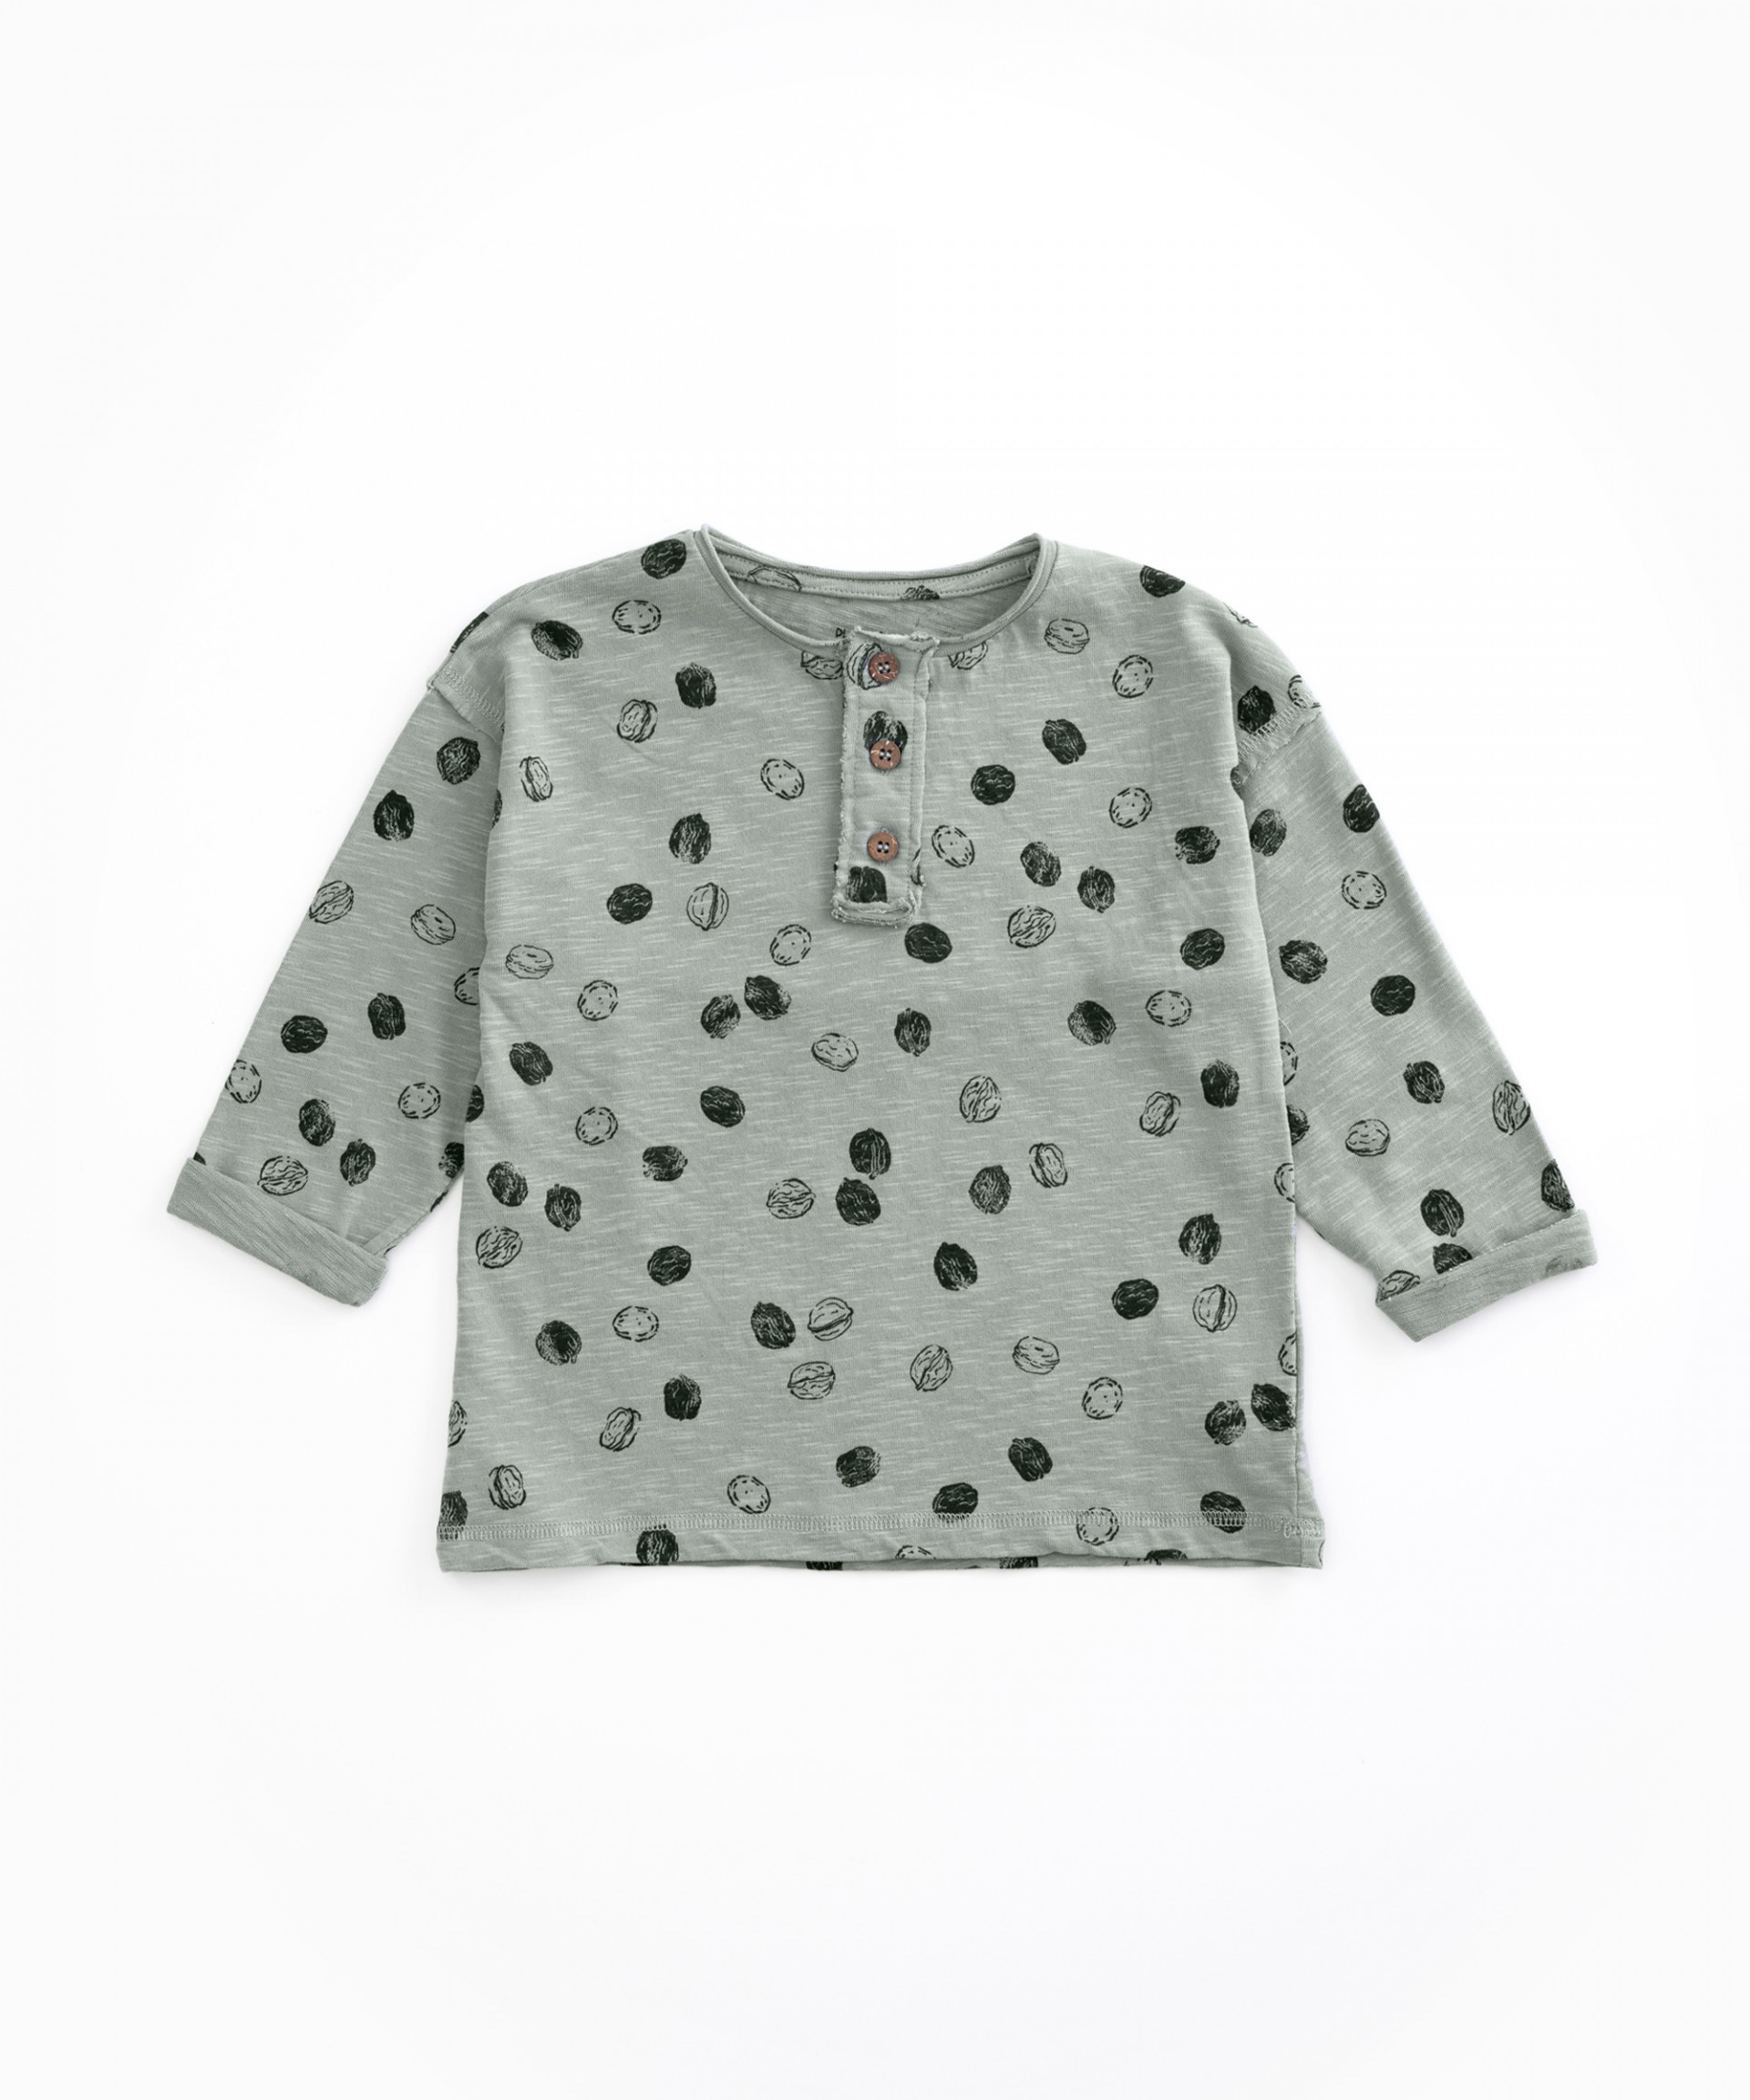 Camiseta de algodón orgánico con abertura | Woodwork